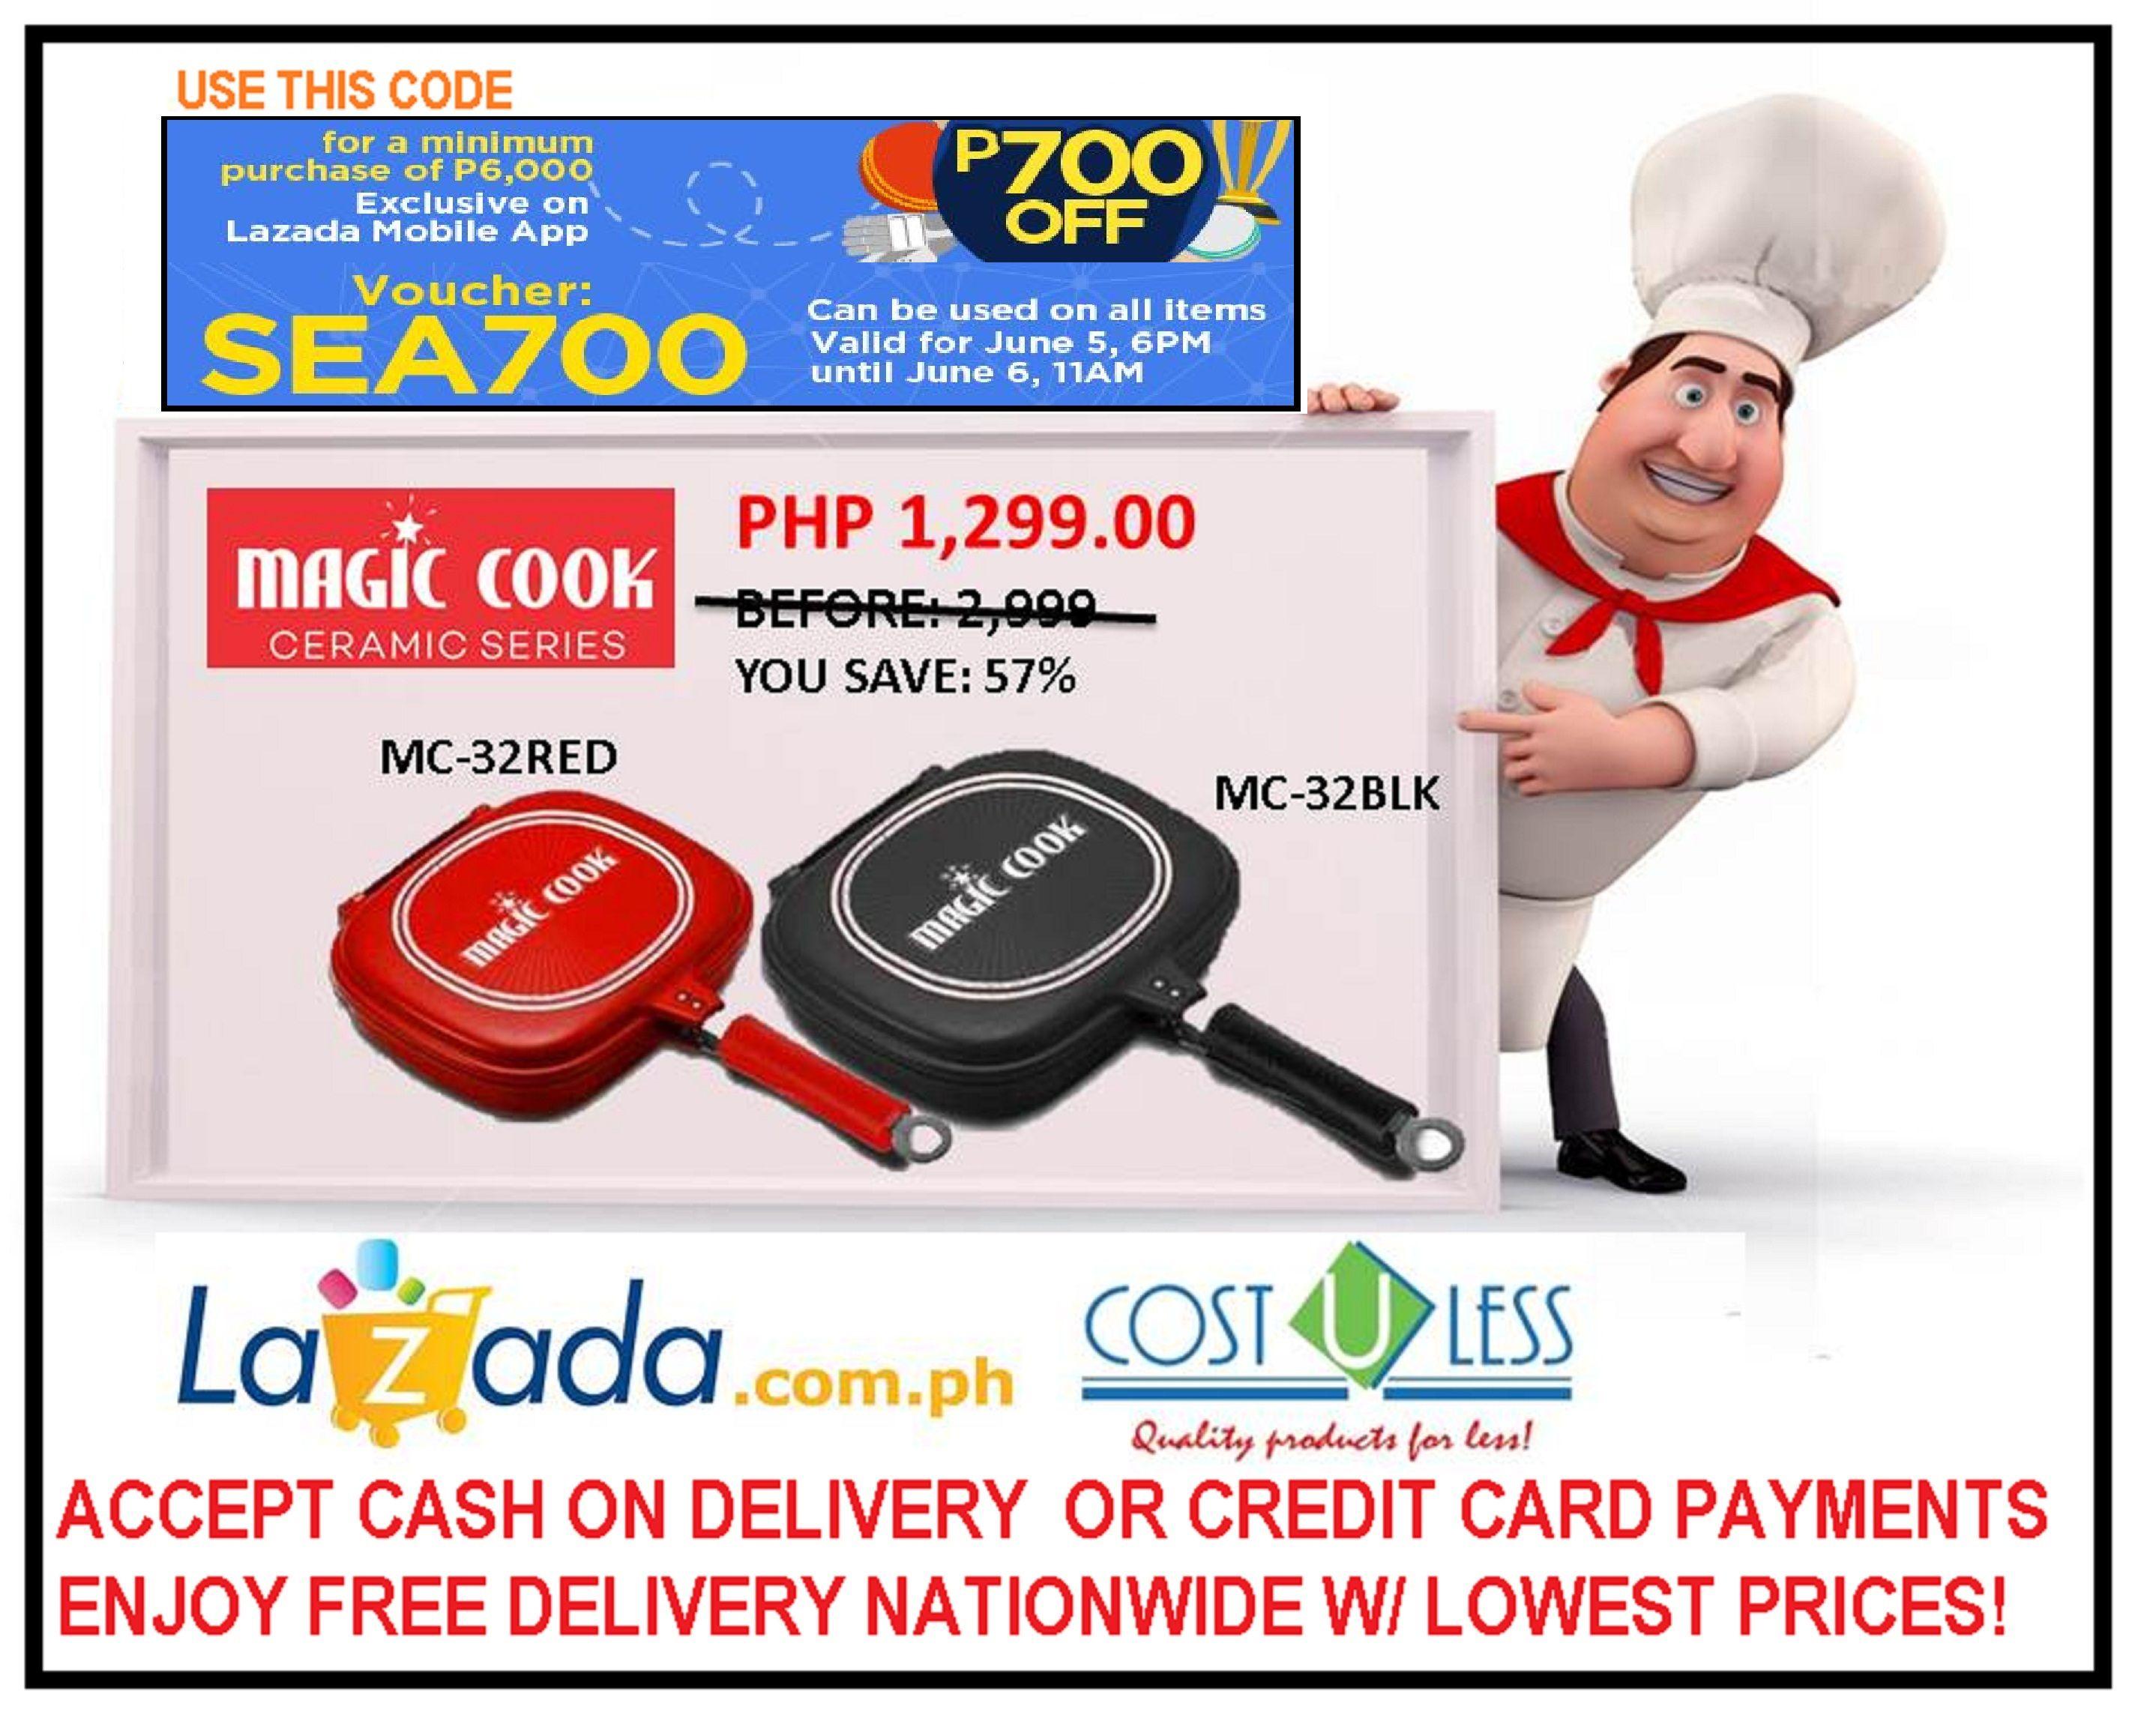 Interior Solutions Kitchens Kitchen Furniture Sale Lazada Sea Games Tribute Promo Save P700